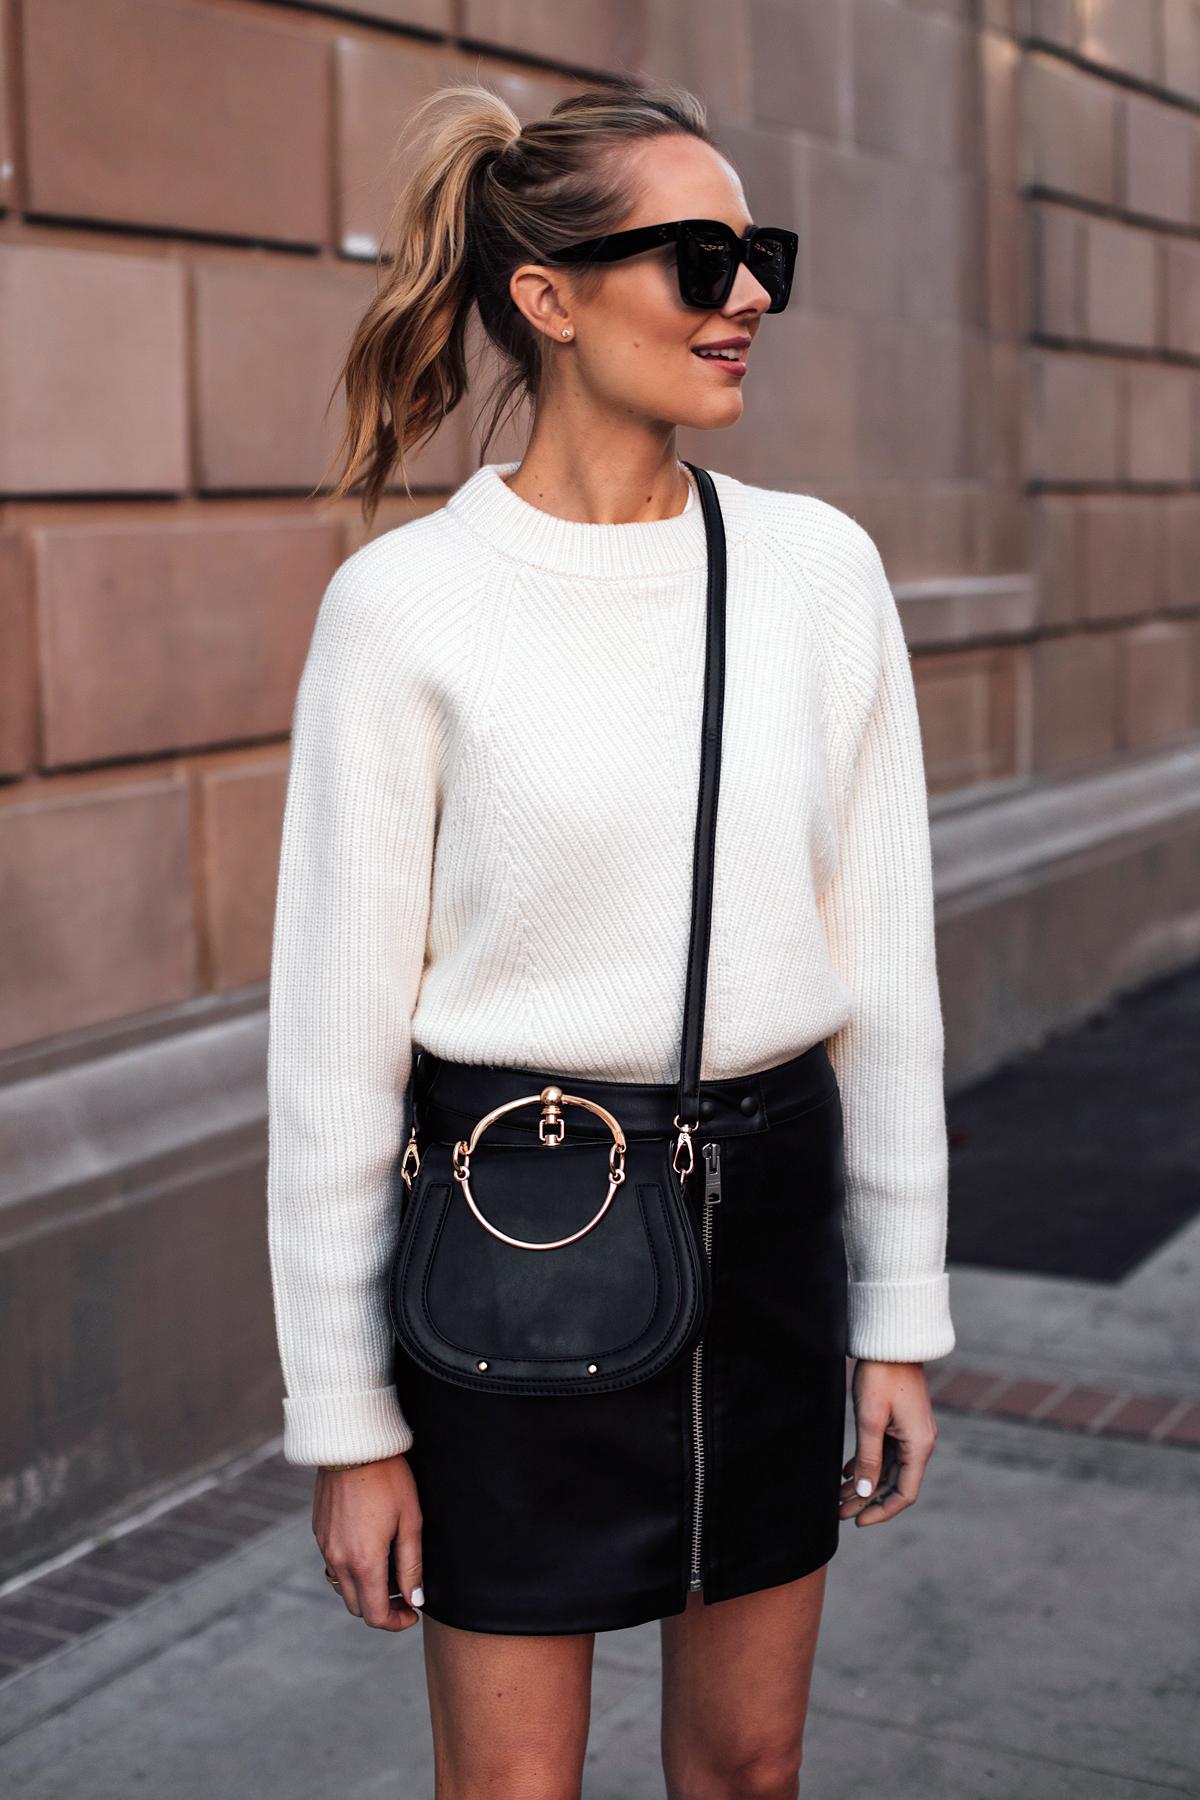 Blonde Woman Wearing AllSaints White Sweater Black Faux Leather Mini Skirt Black Chloe Nile Dupe Fashion Jackson San Diego Fashion Blogger Street Style